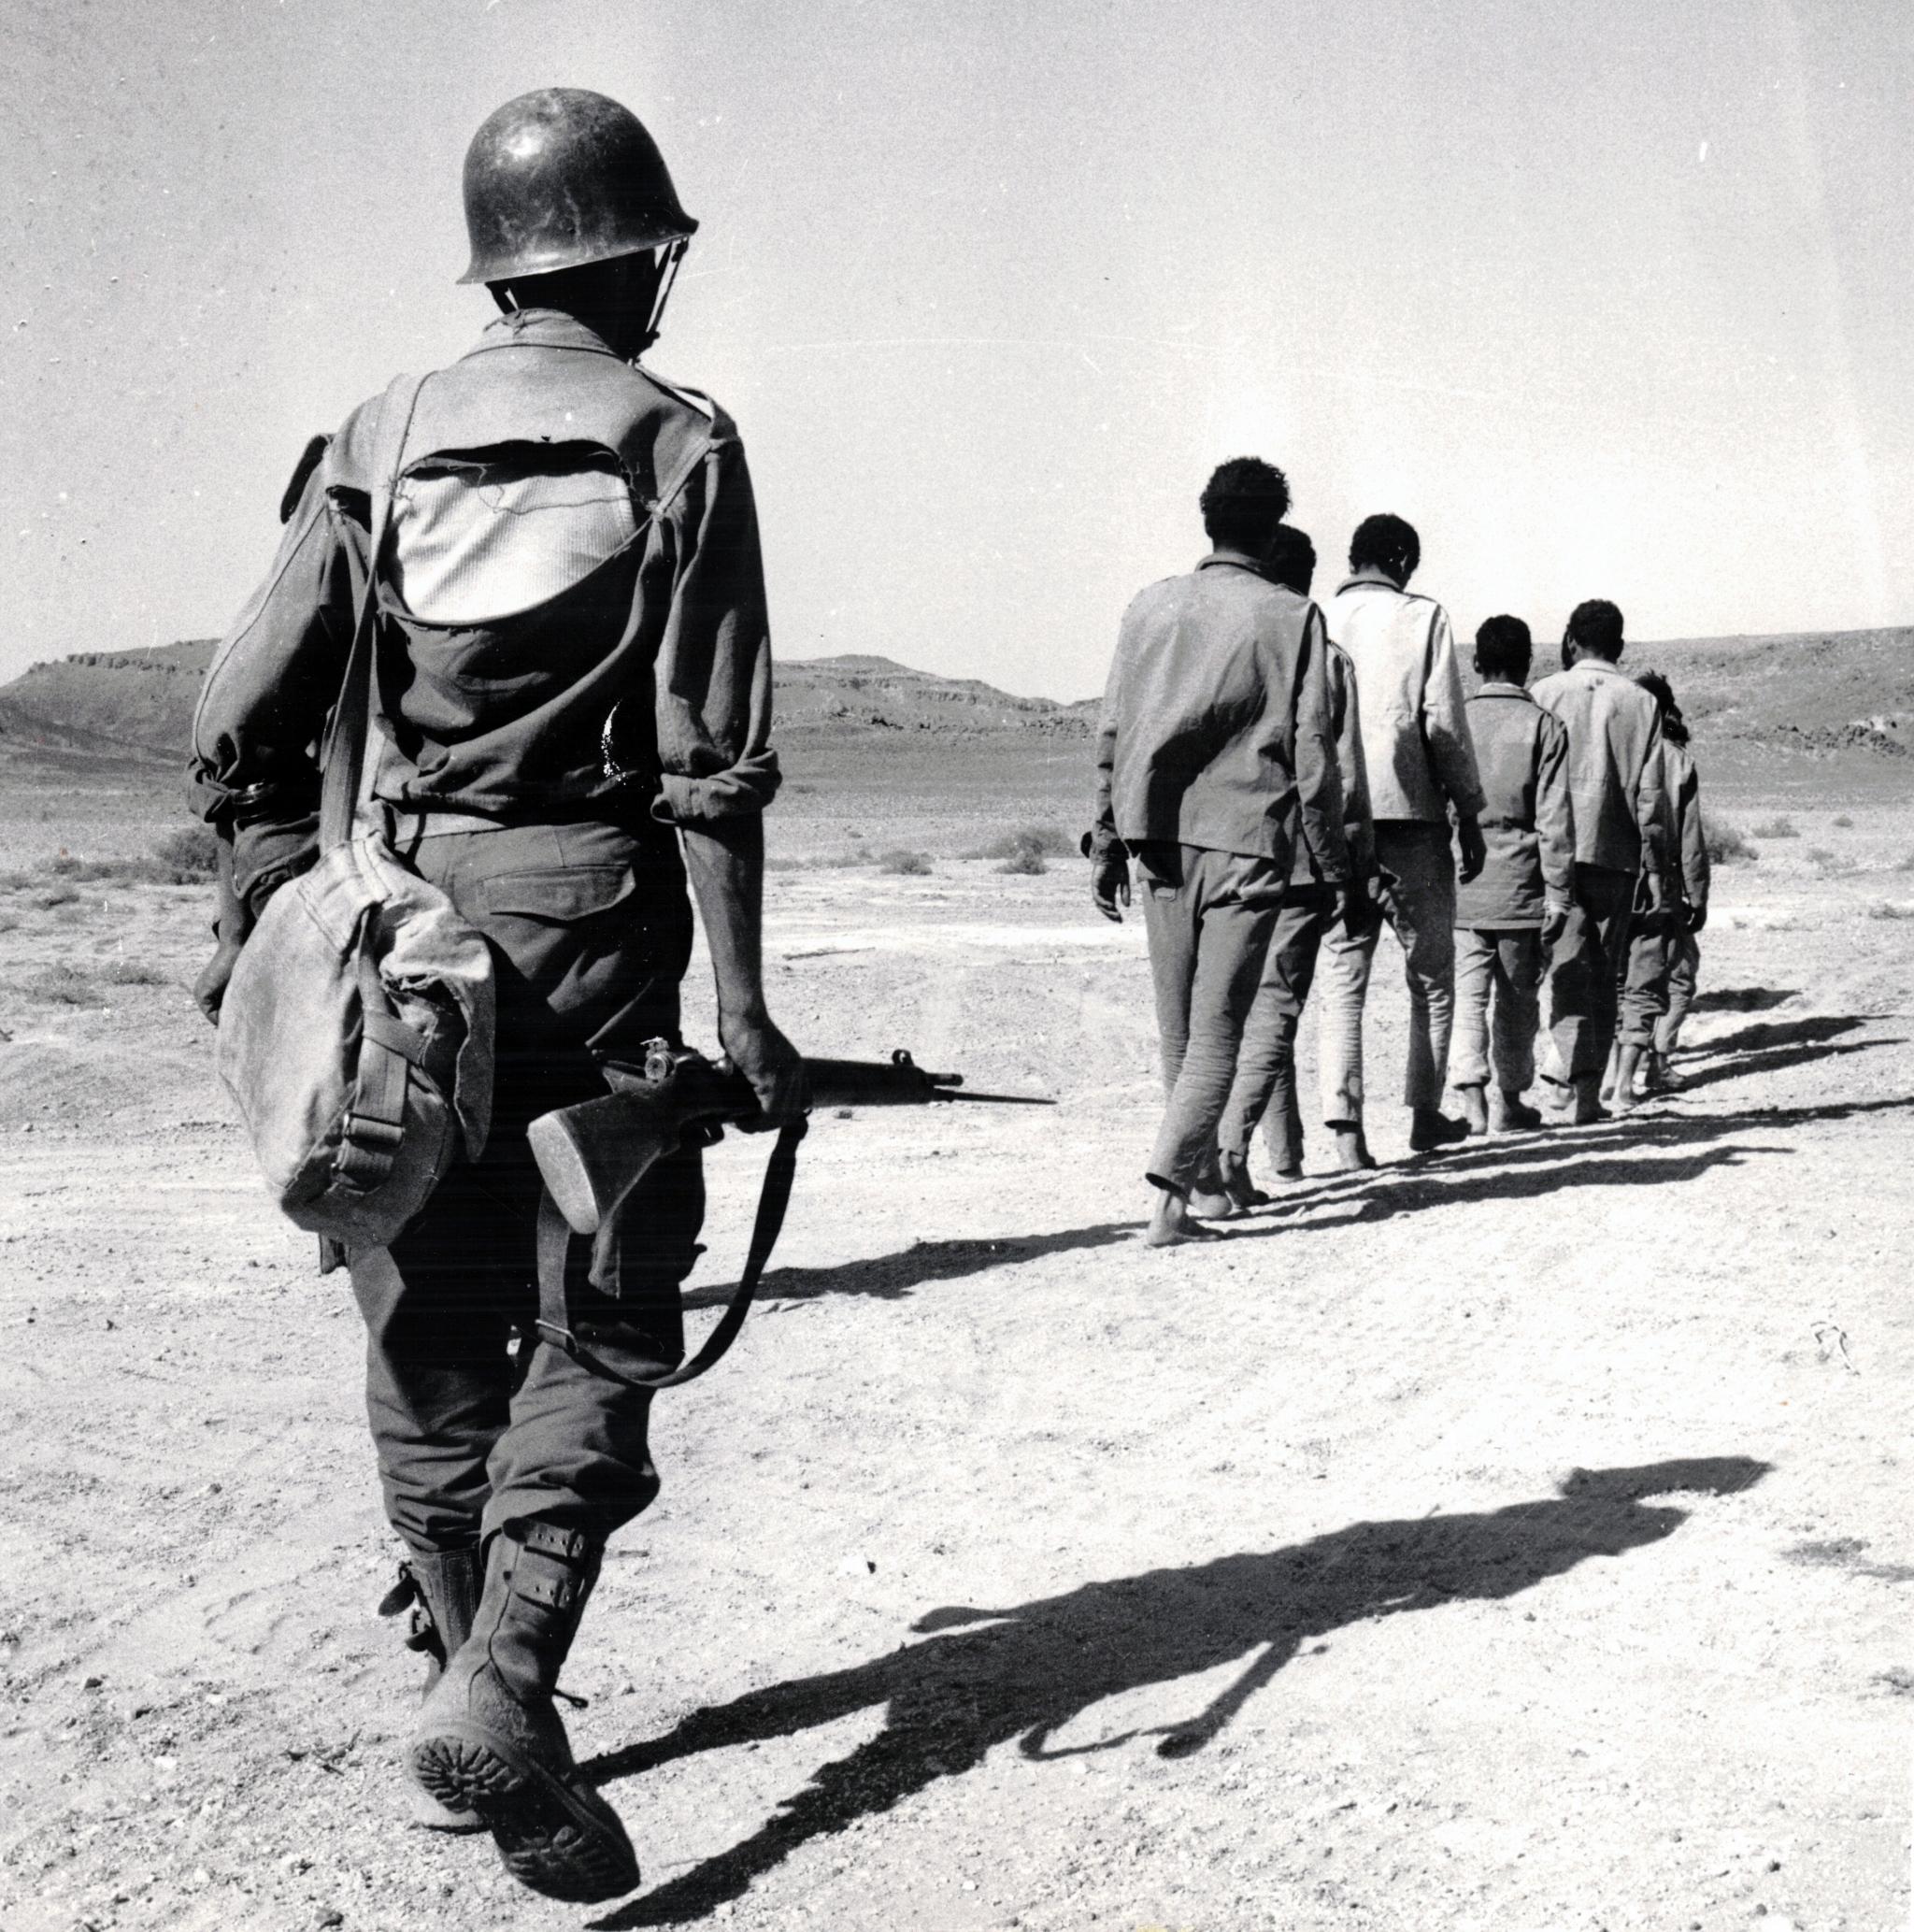 Photos - Guerre des Sables - 1963 - Page 8 46993898905_f5edeaec74_o